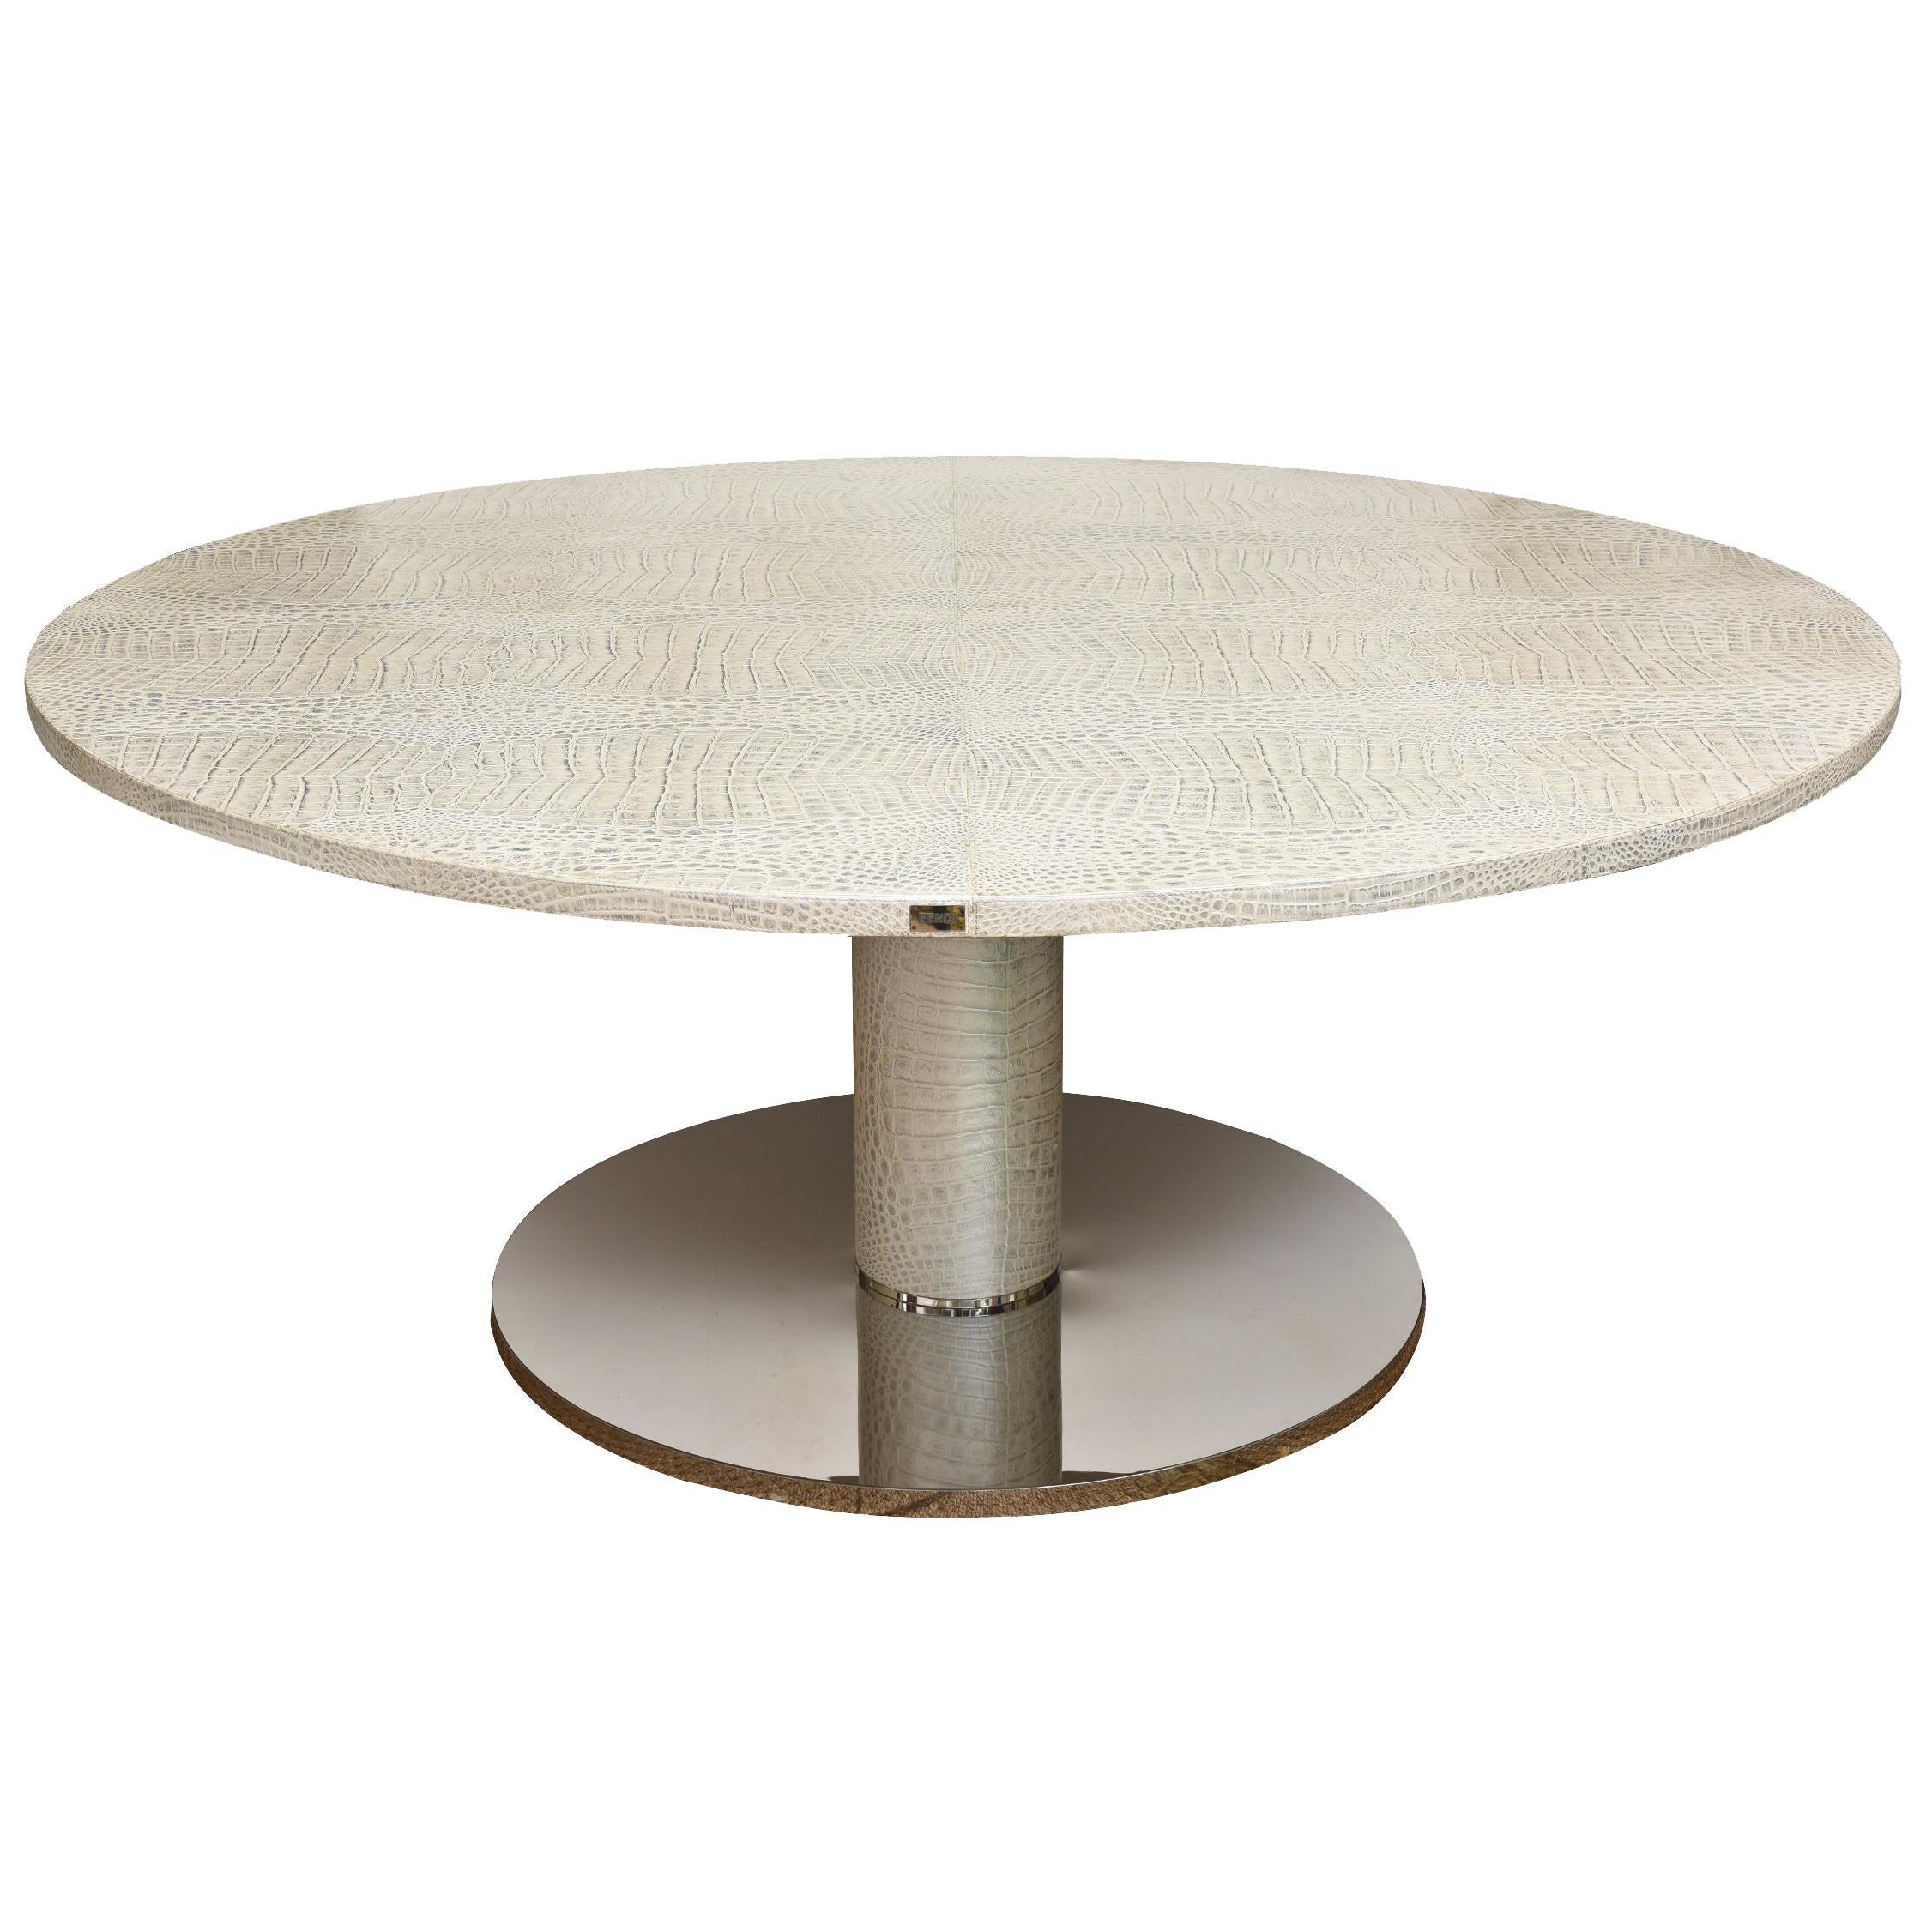 Italian Fendi Round Crocodile Metallic Leather And Stainless Steel Dining  Table